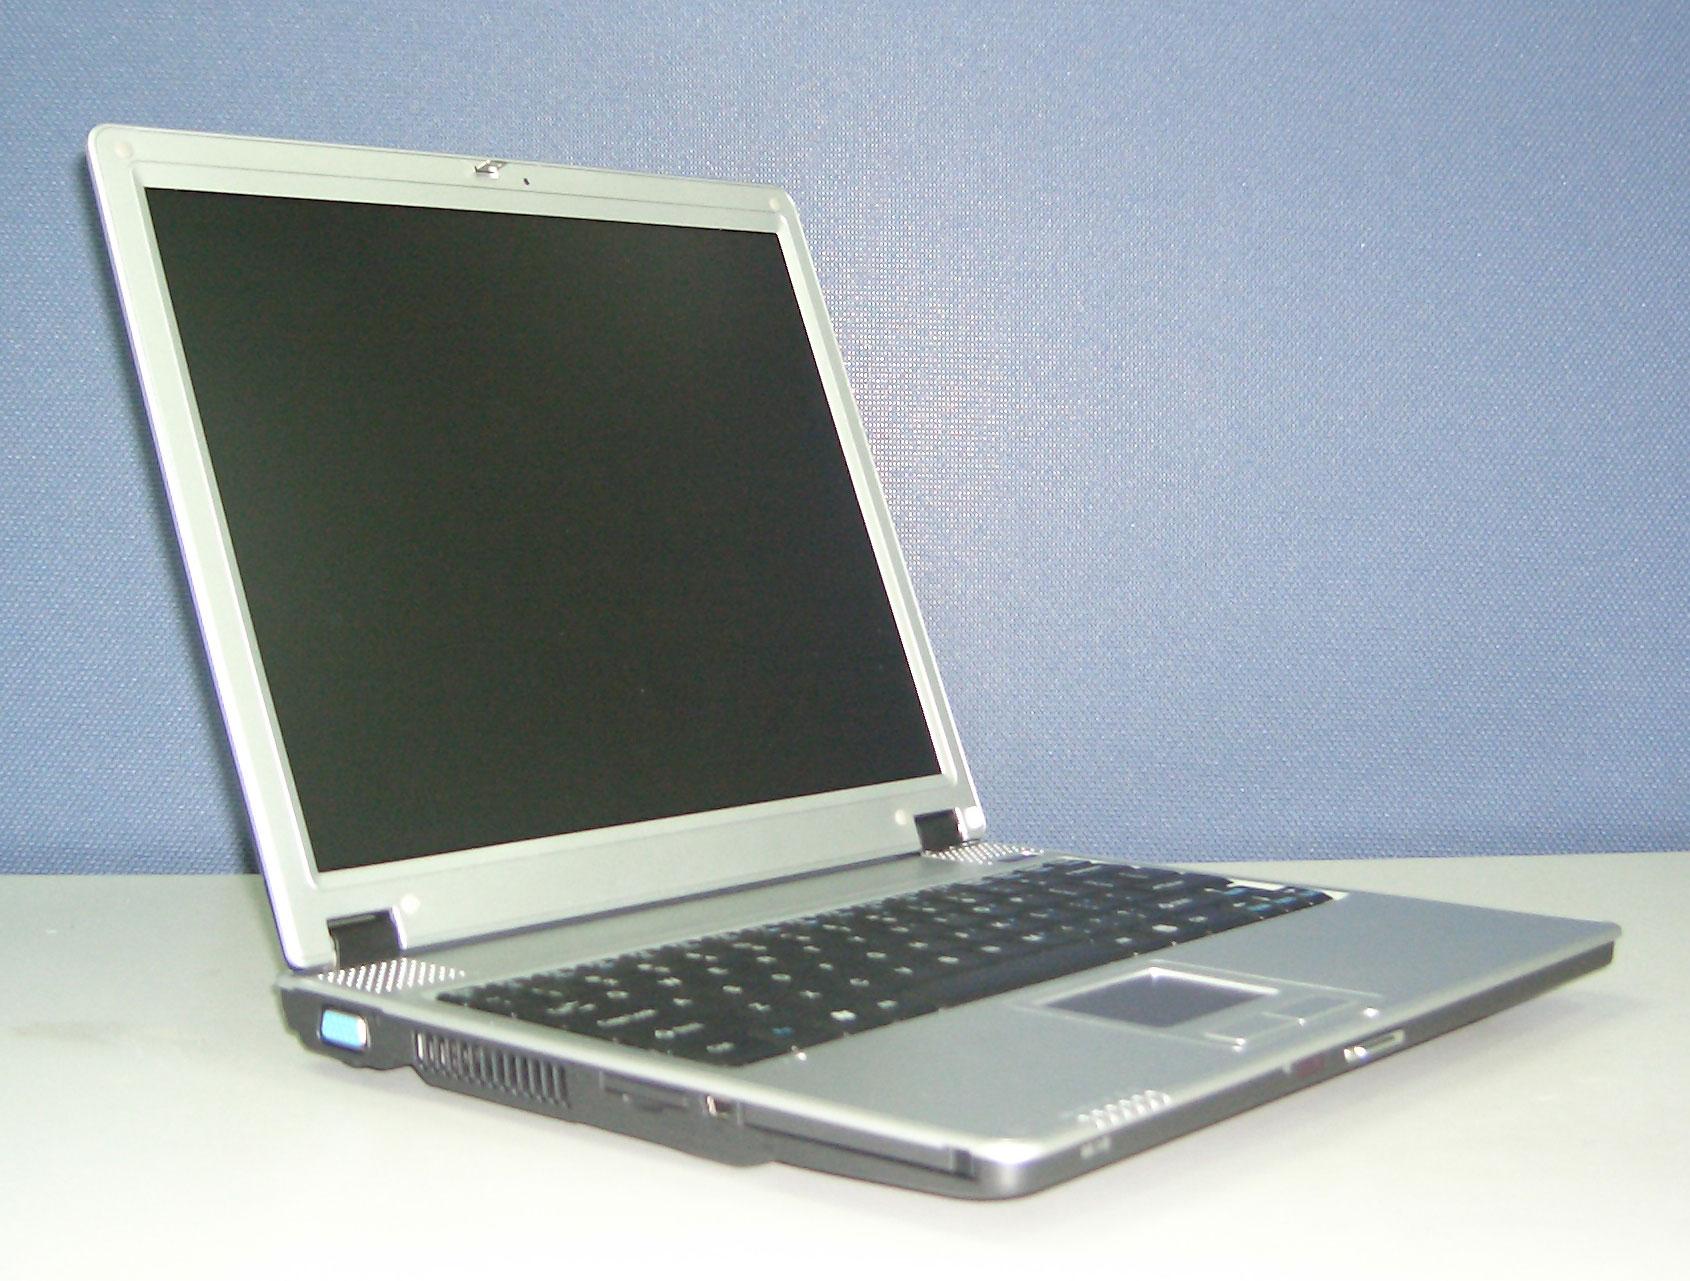 Notebook, notebook computer, laptop, labtop, PC, personal computer, computer har